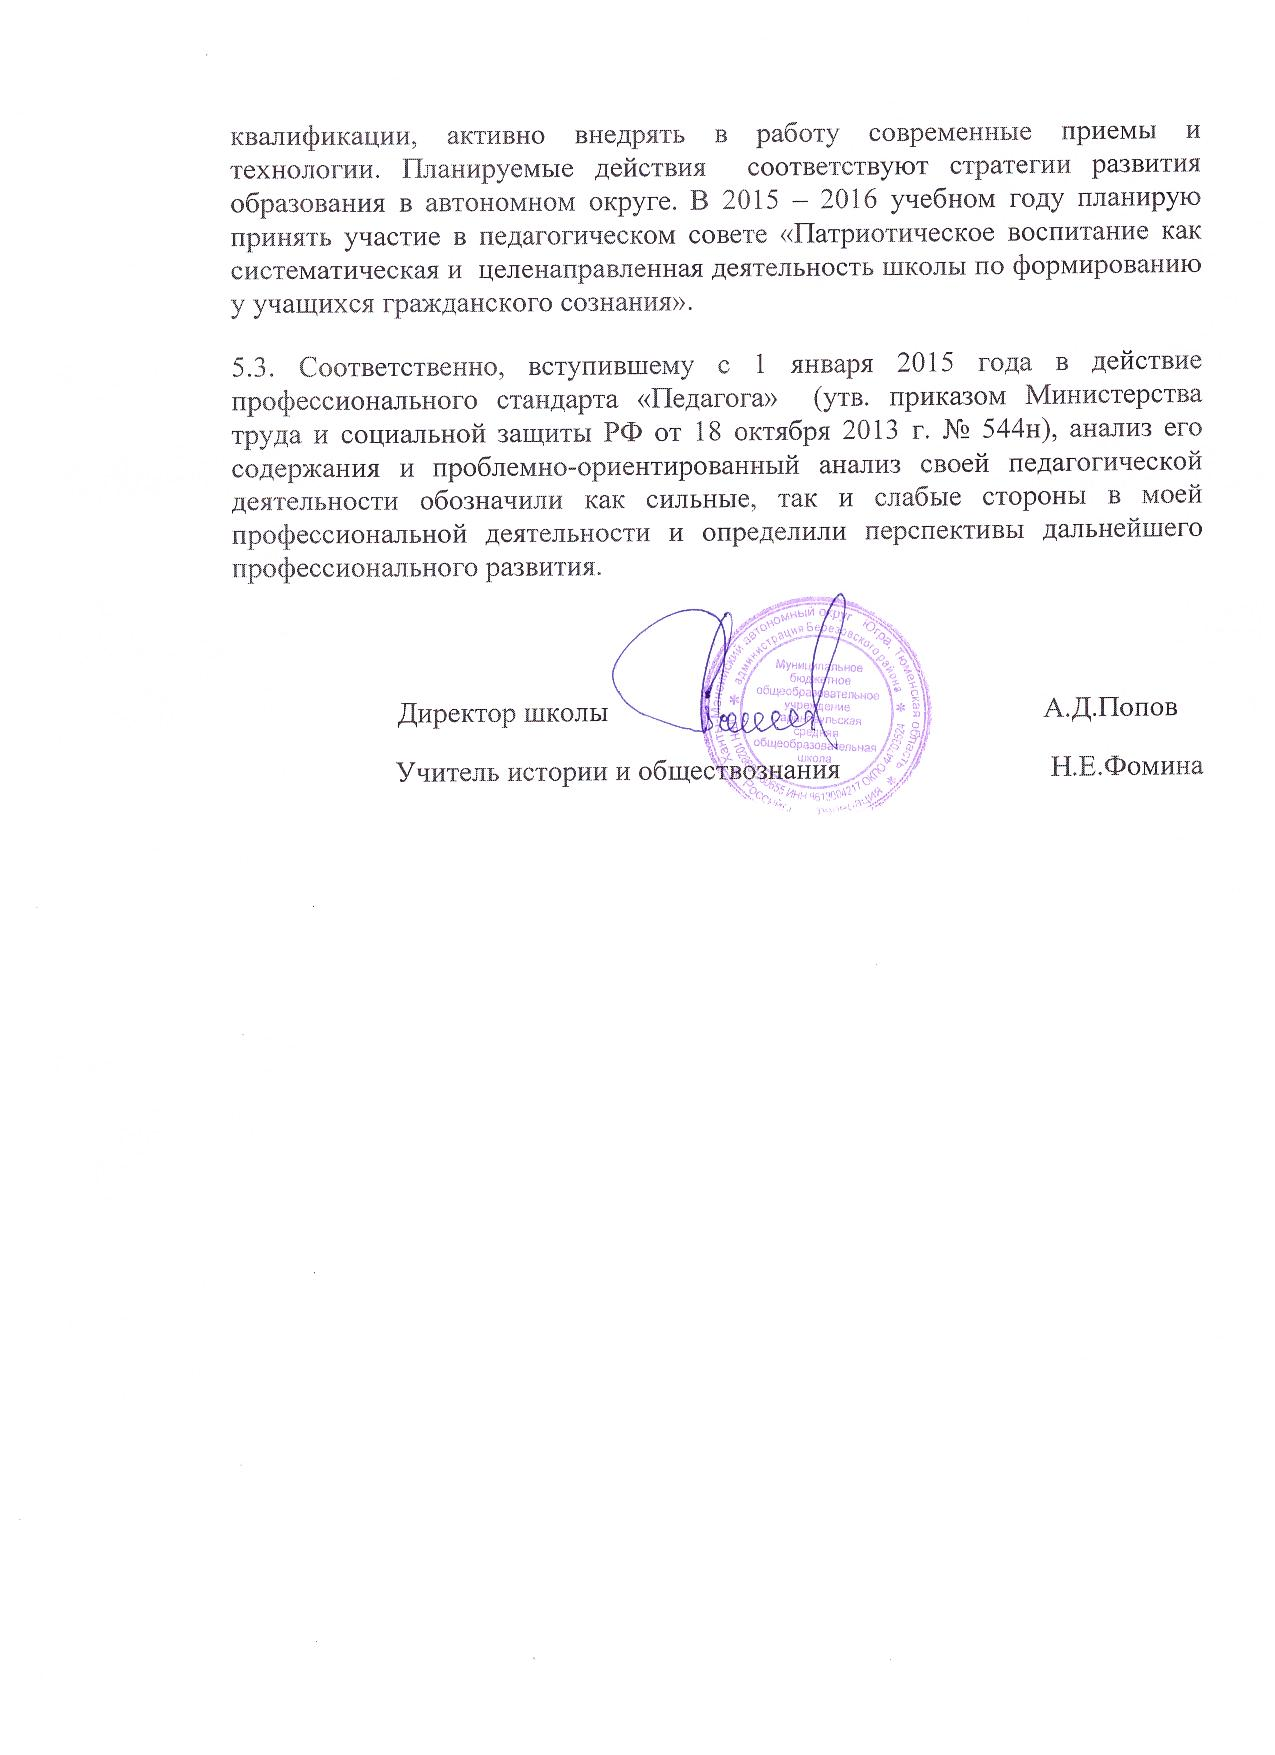 C:\Documents and Settings\1\Рабочий стол\Изображение 004.jpg